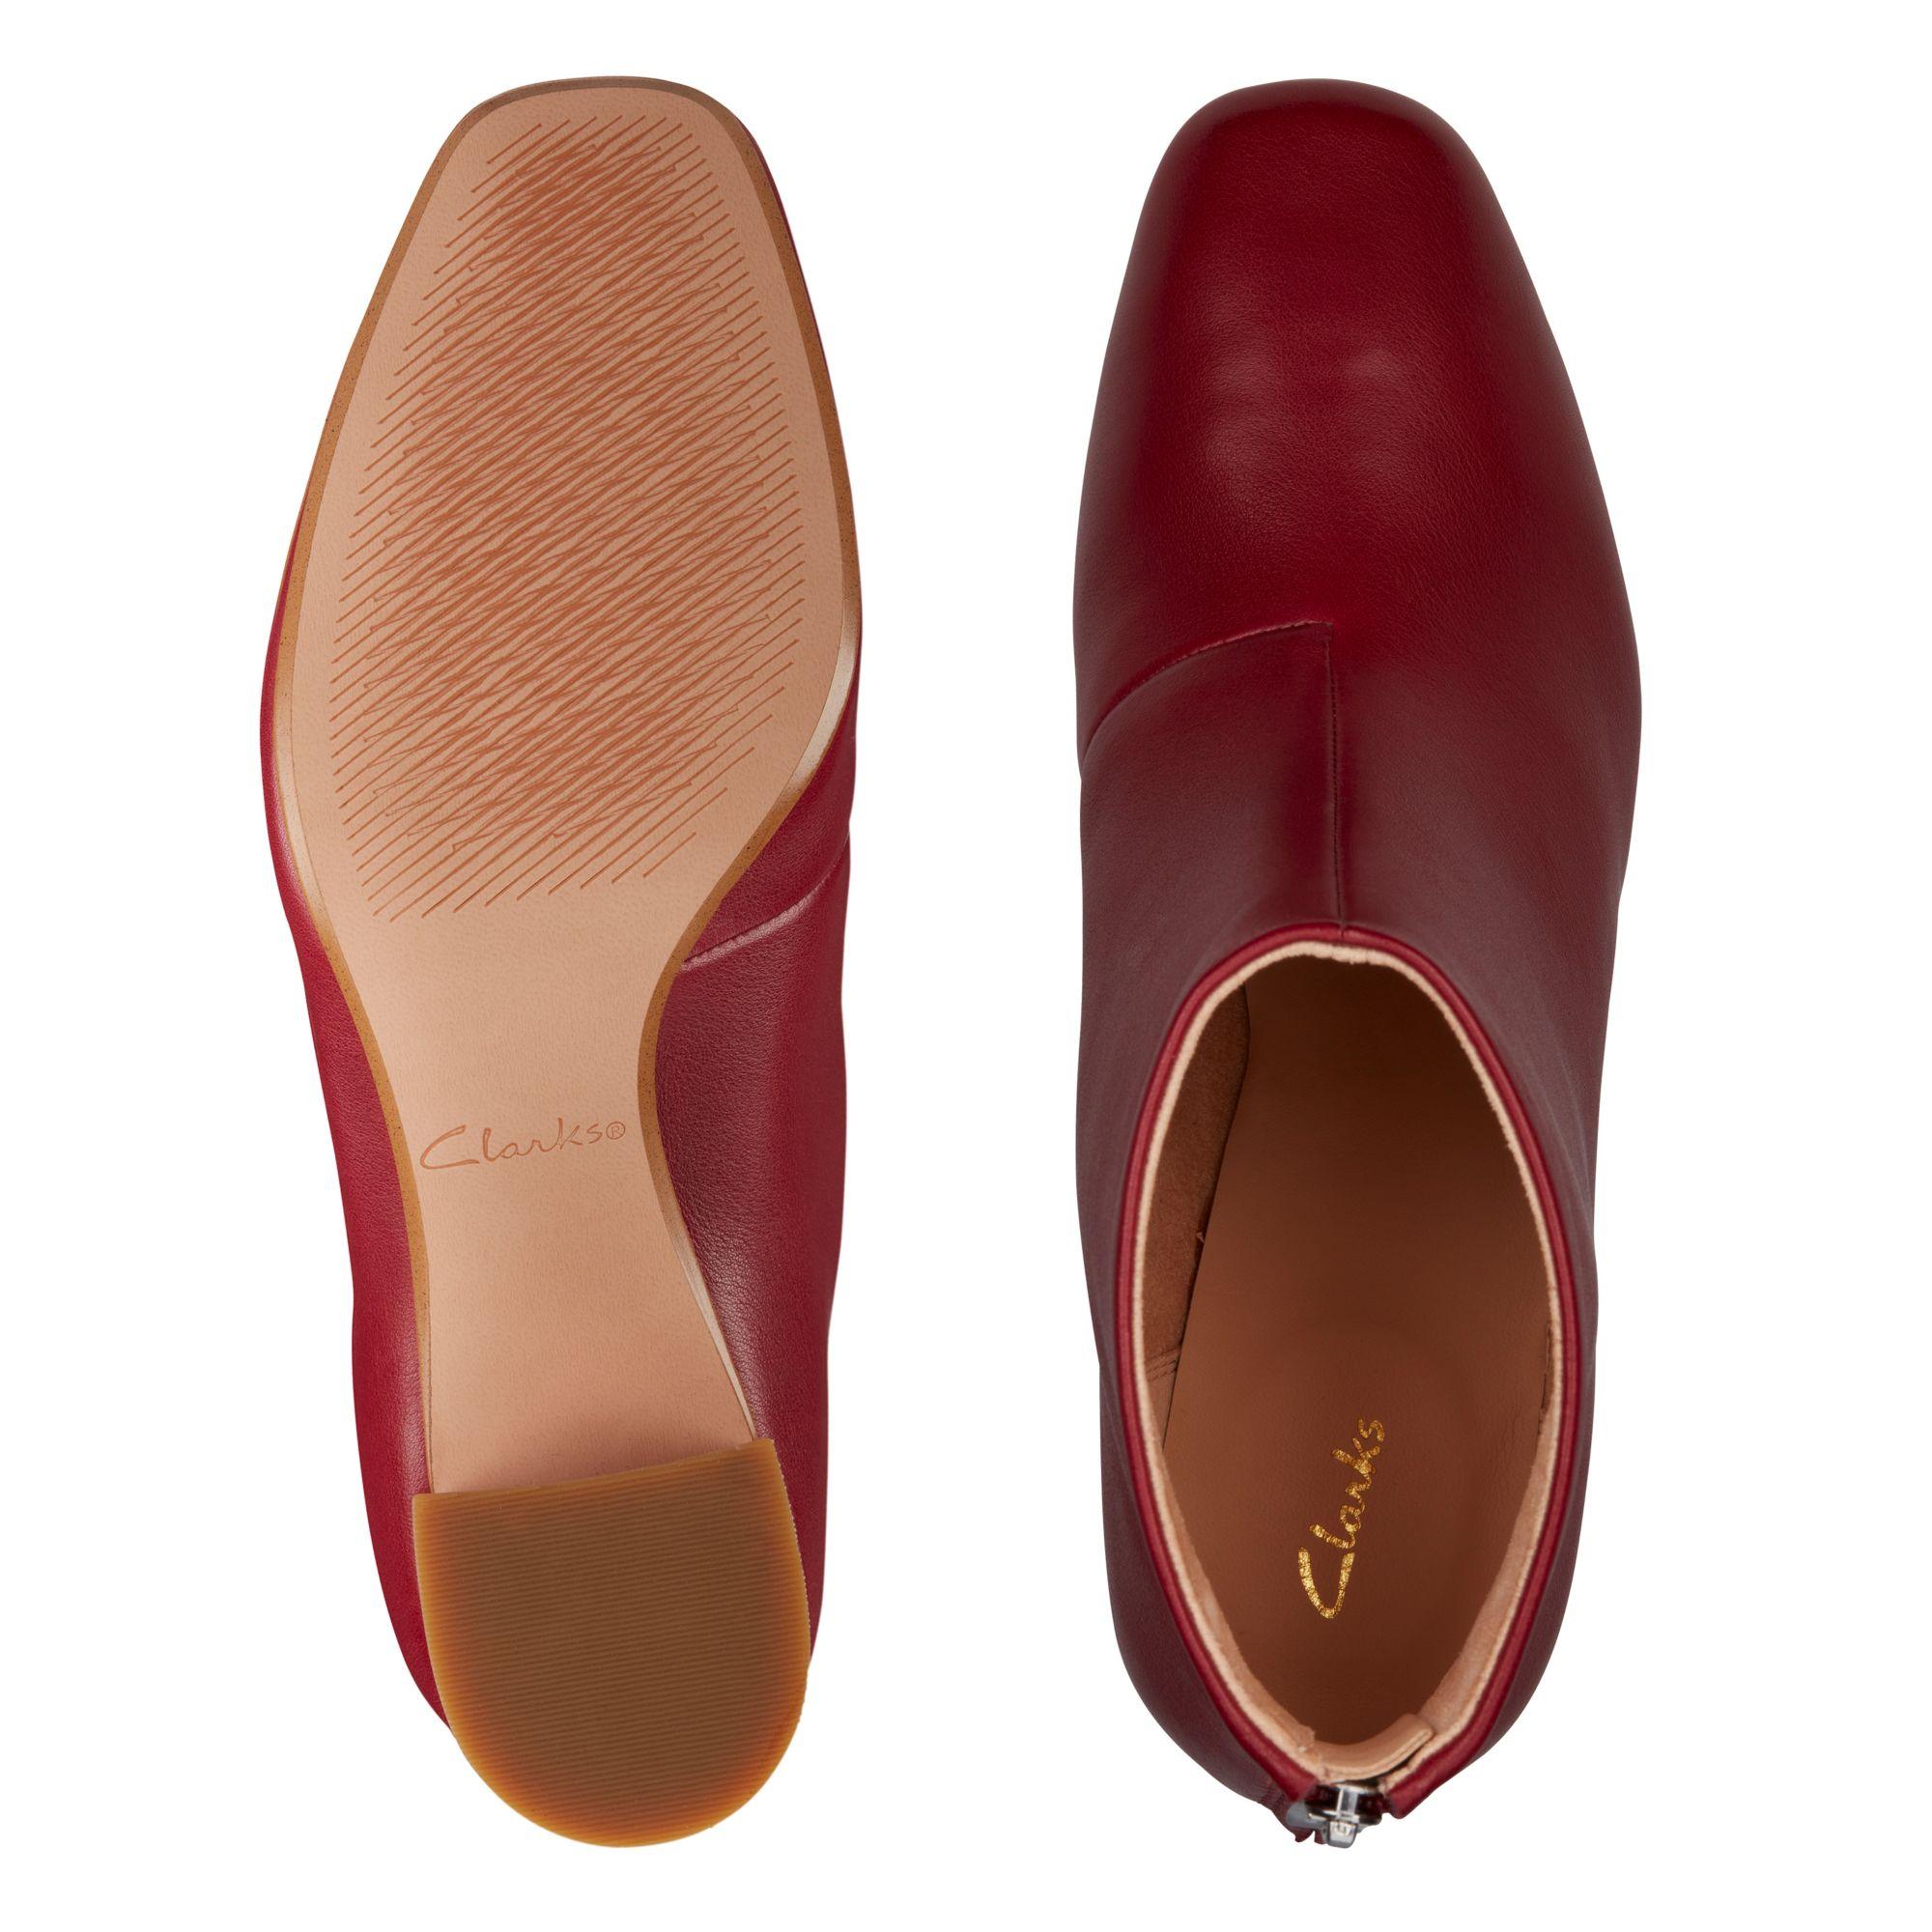 Дамски елегантни боти Clarks Sheer55 Zip Wine Leather червени - снимка 7